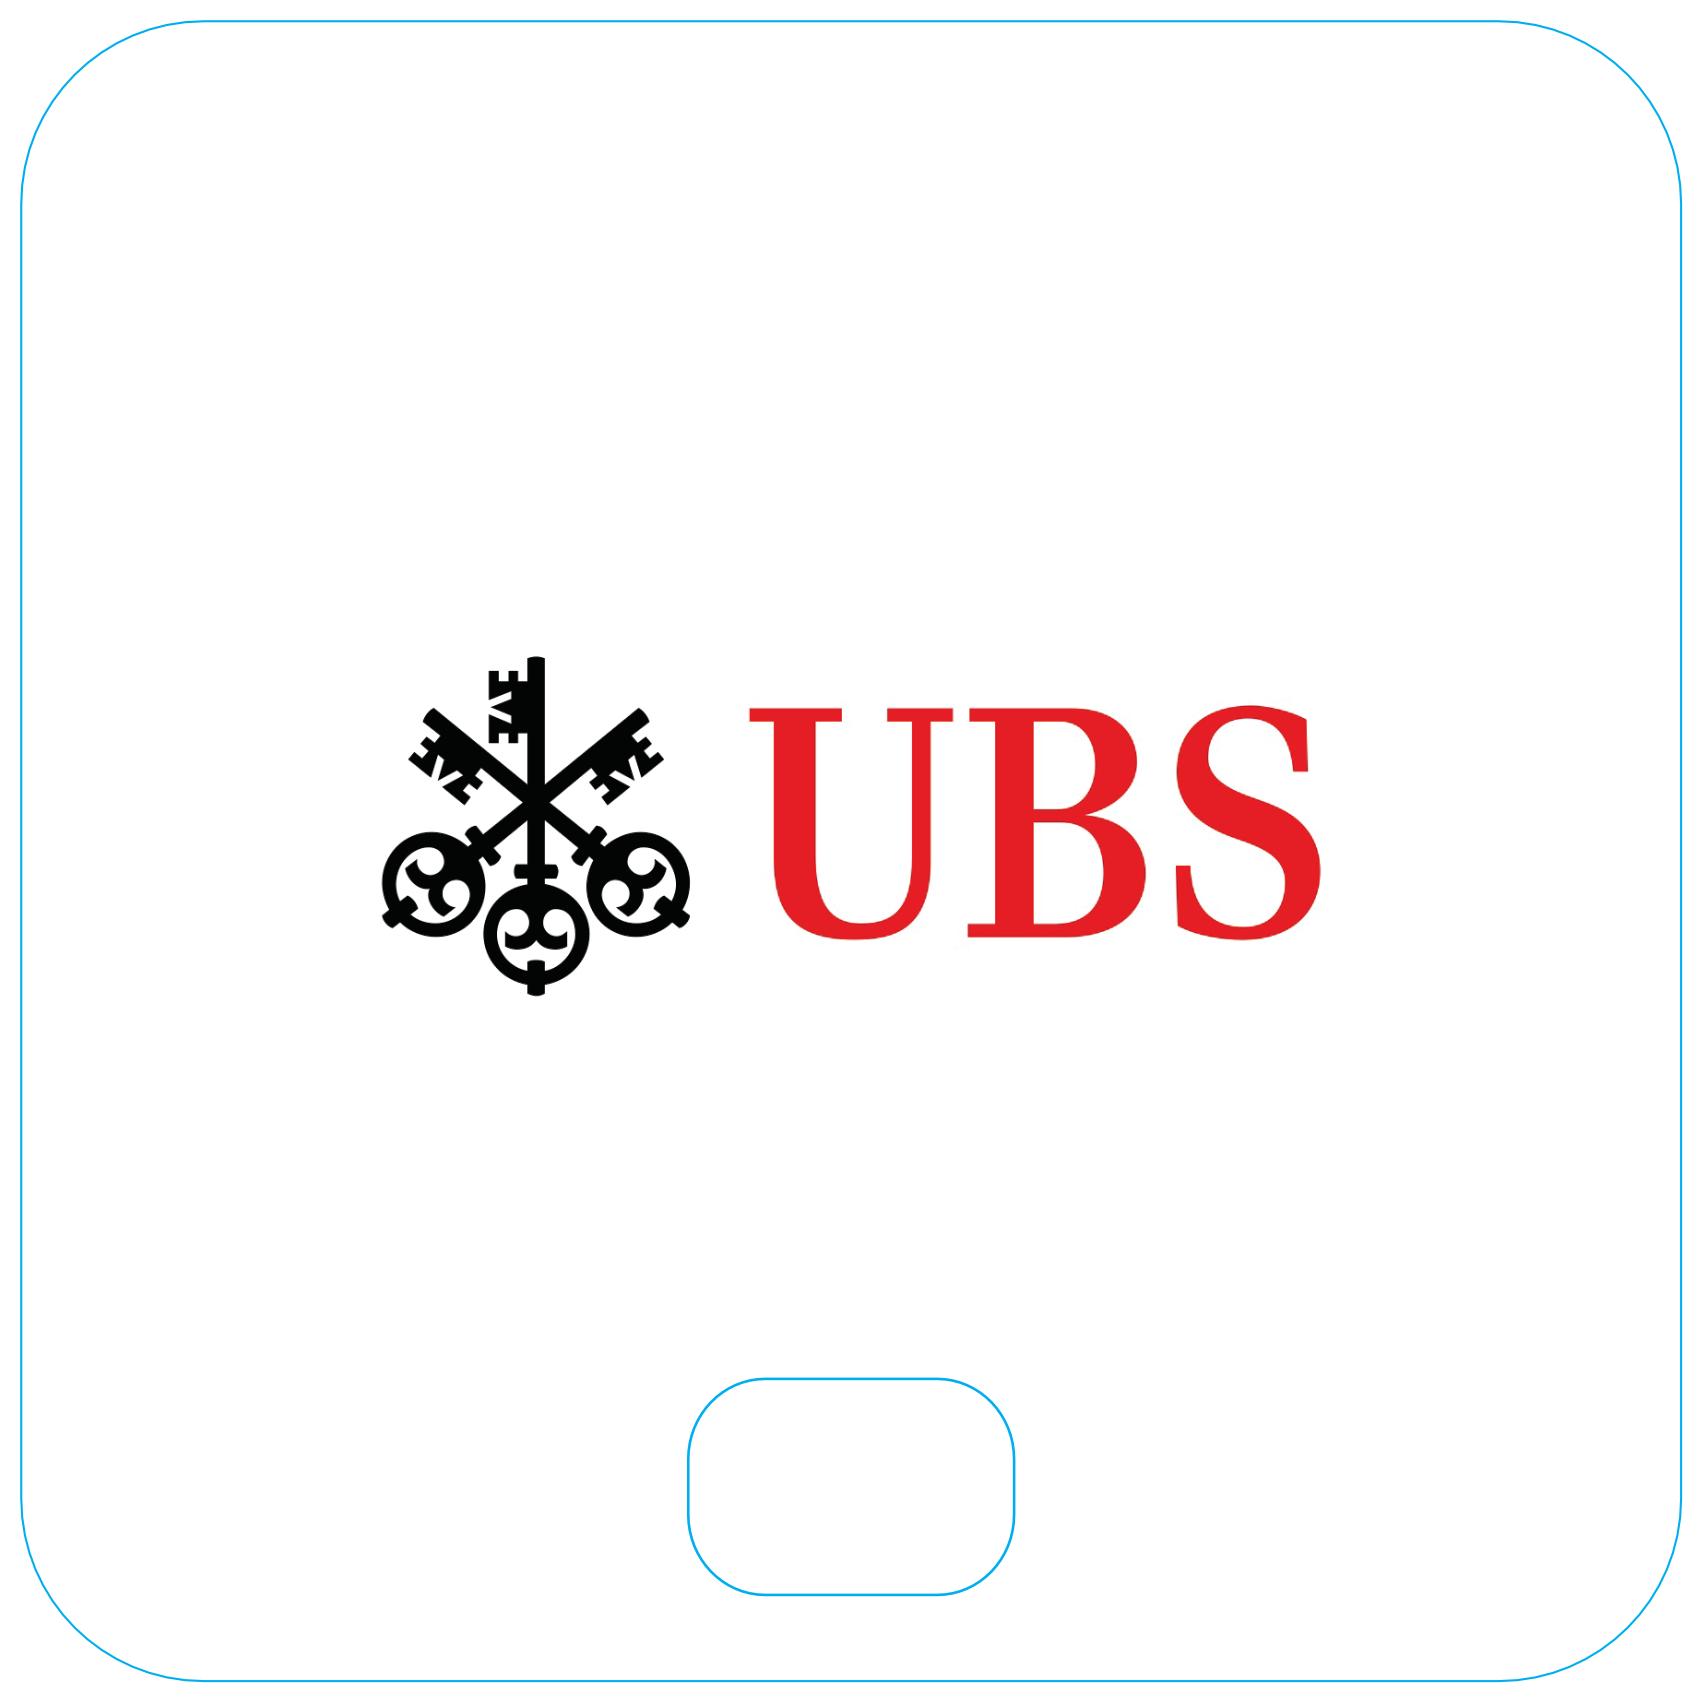 UBS 7.2 x 7.2